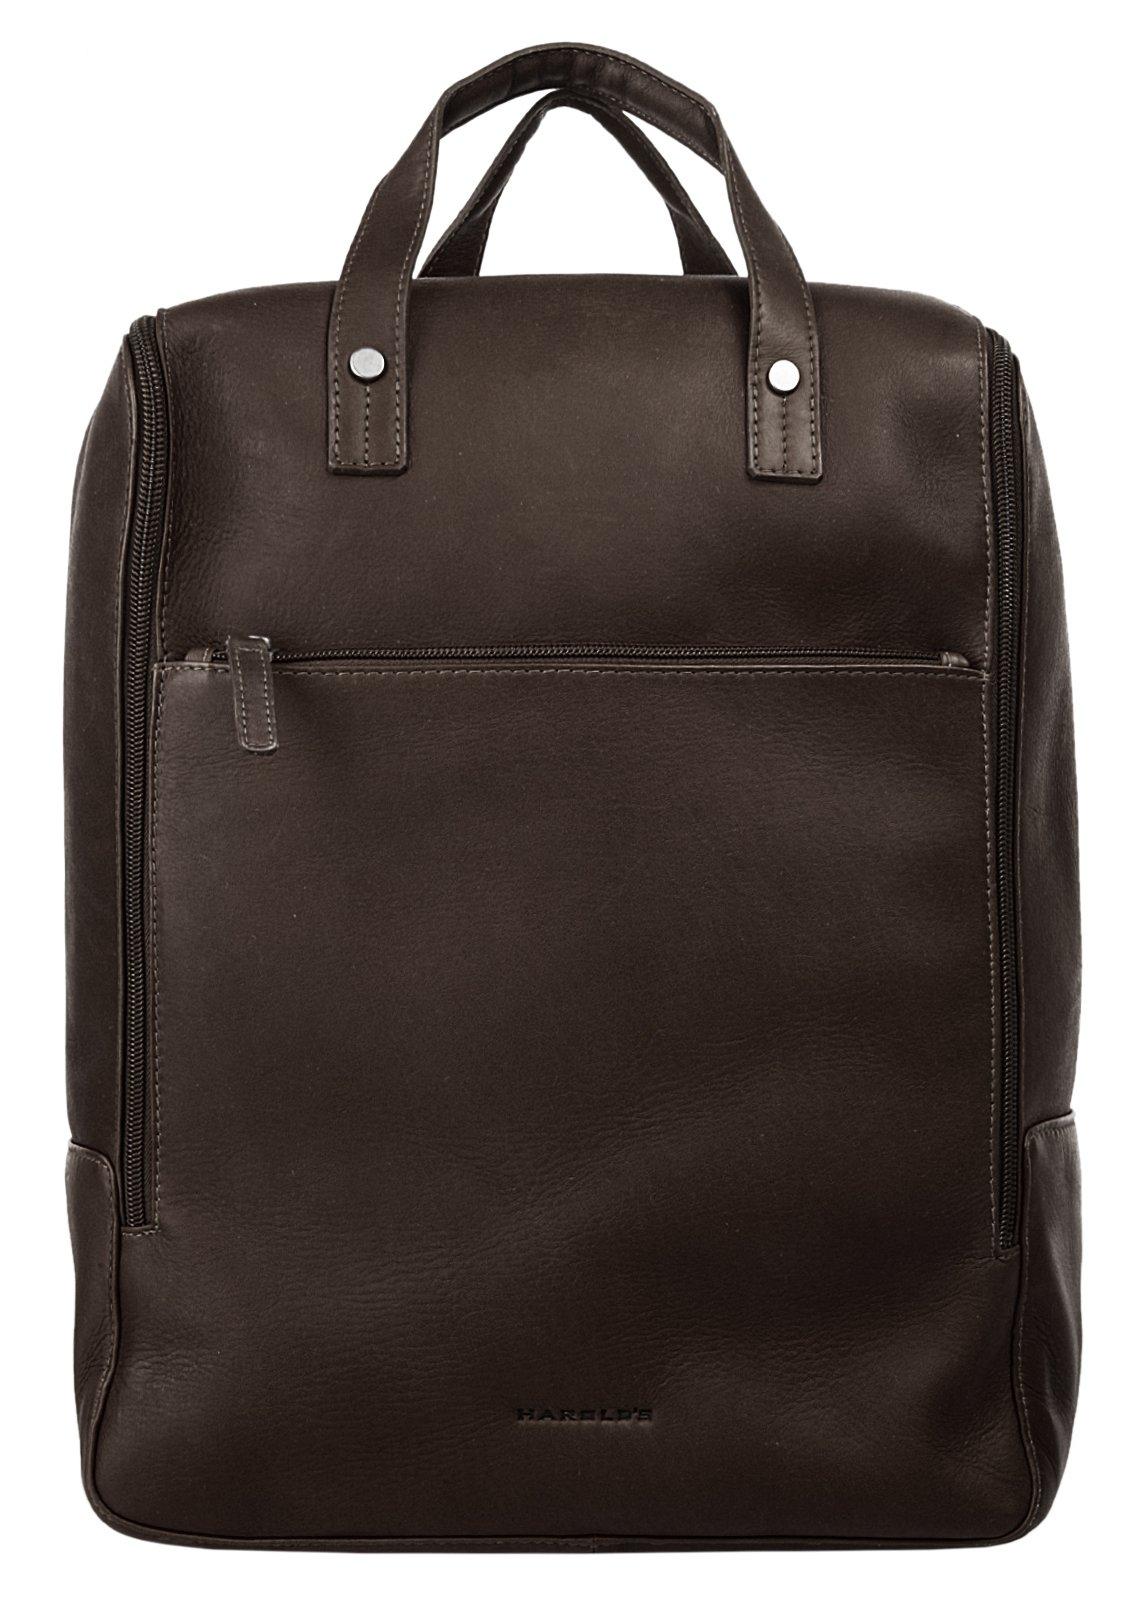 Harold's rugzak CAMPO (1) in de webshop van OTTO kopen